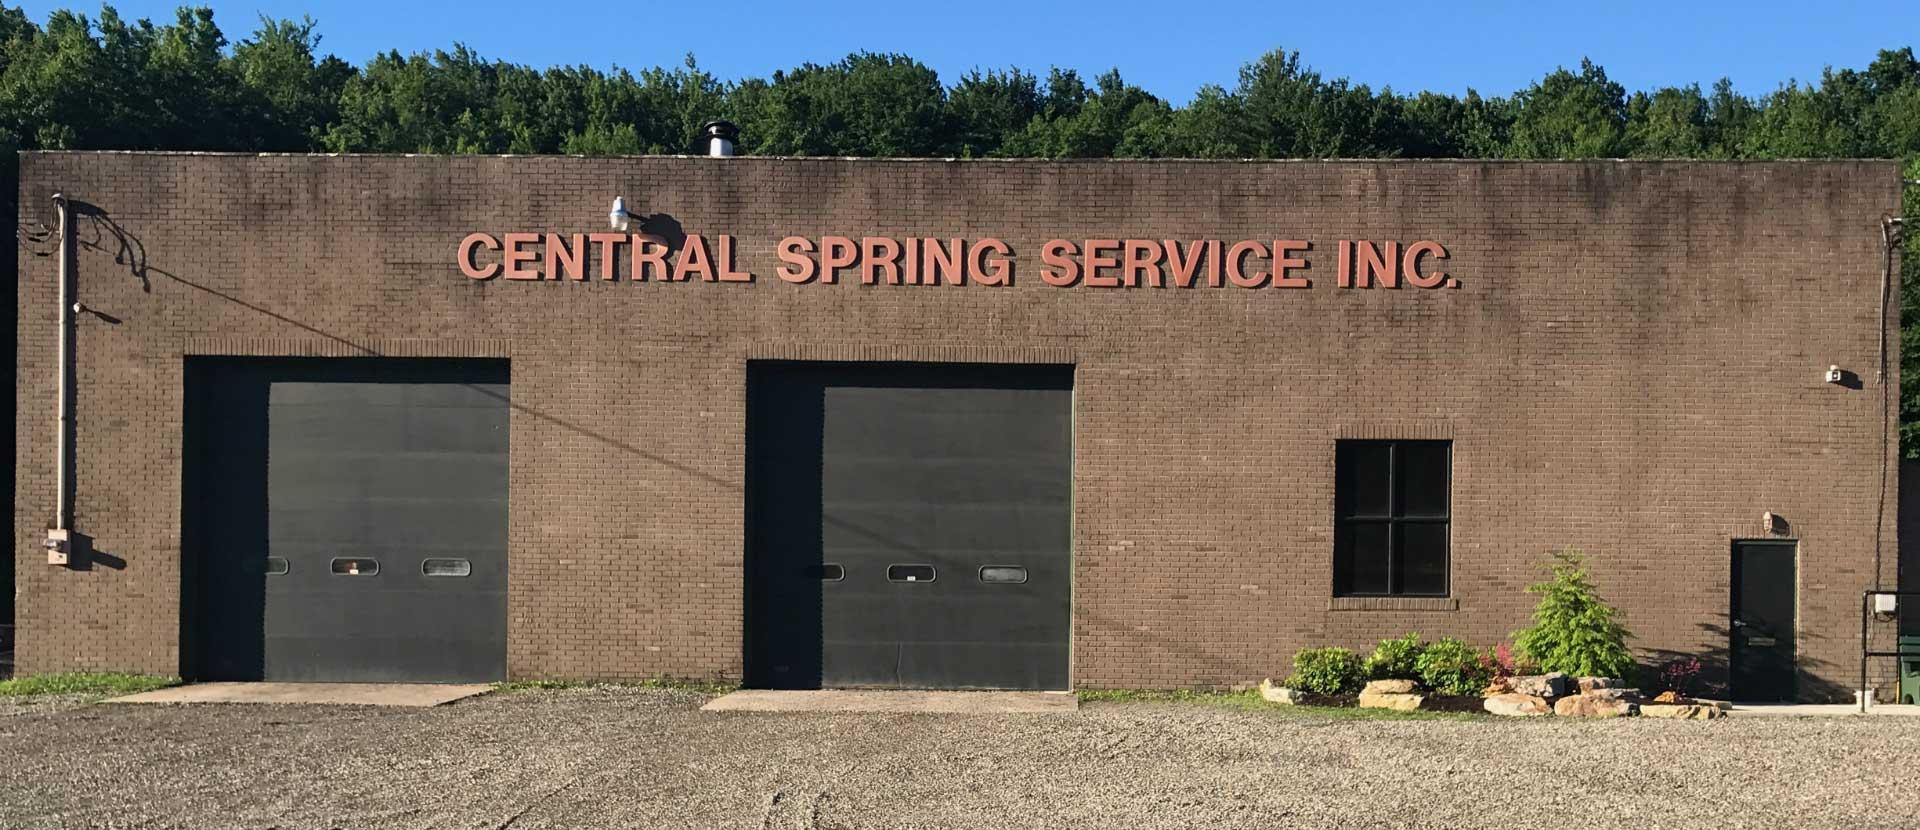 central spring service shop